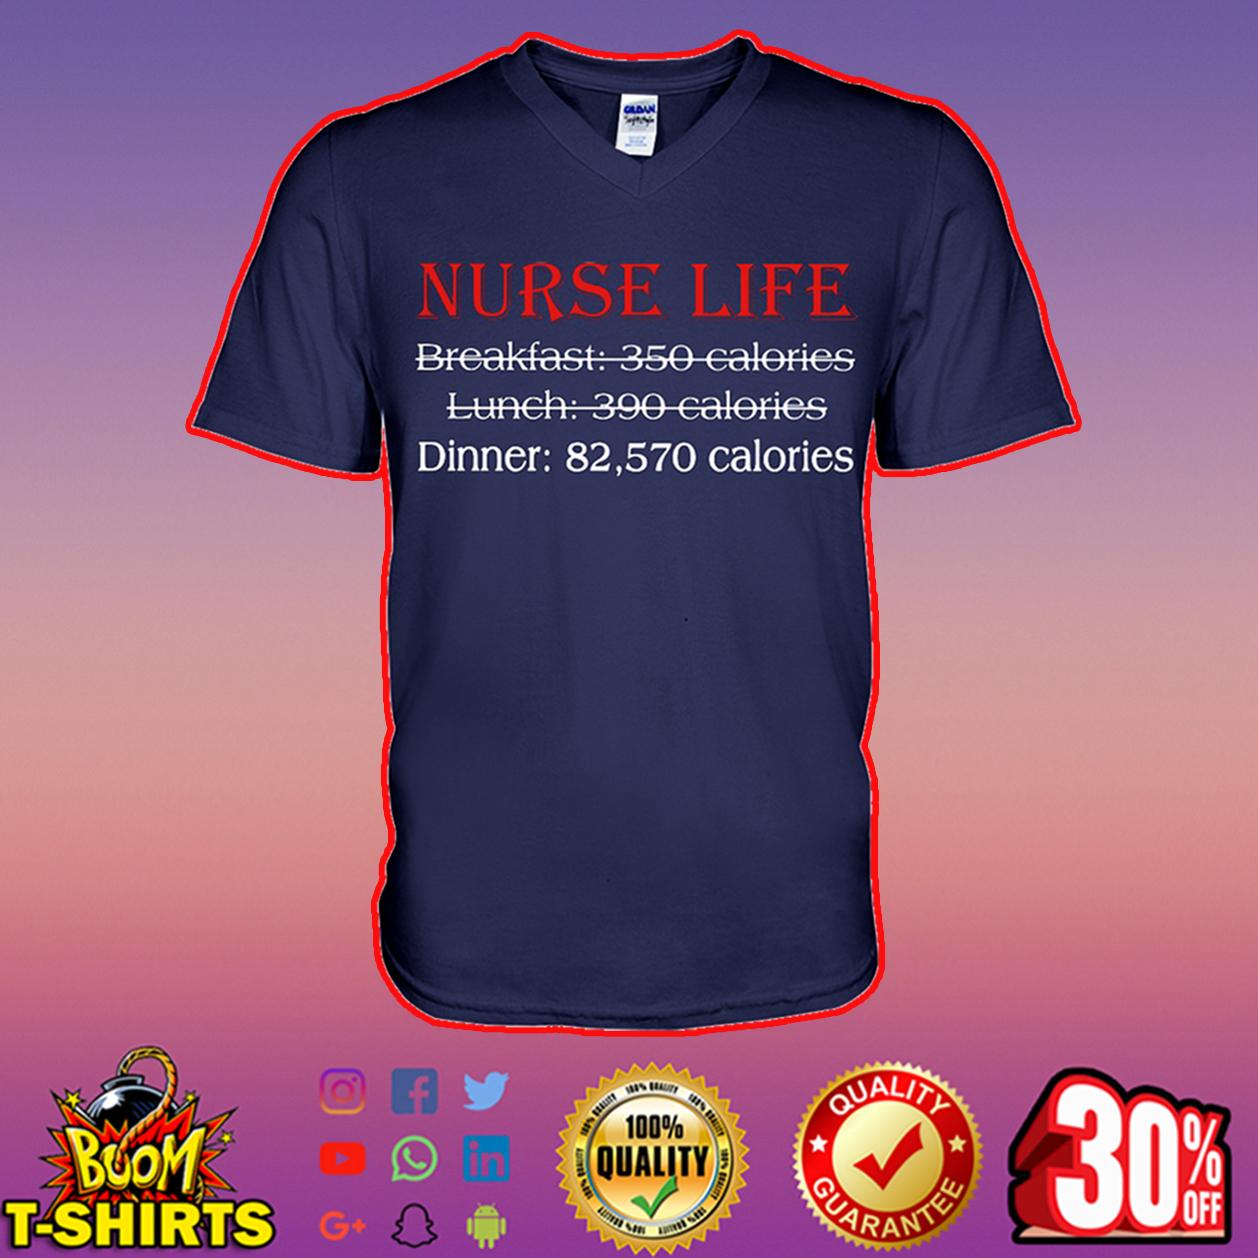 Nurse life dinner 82570 calories v-neck